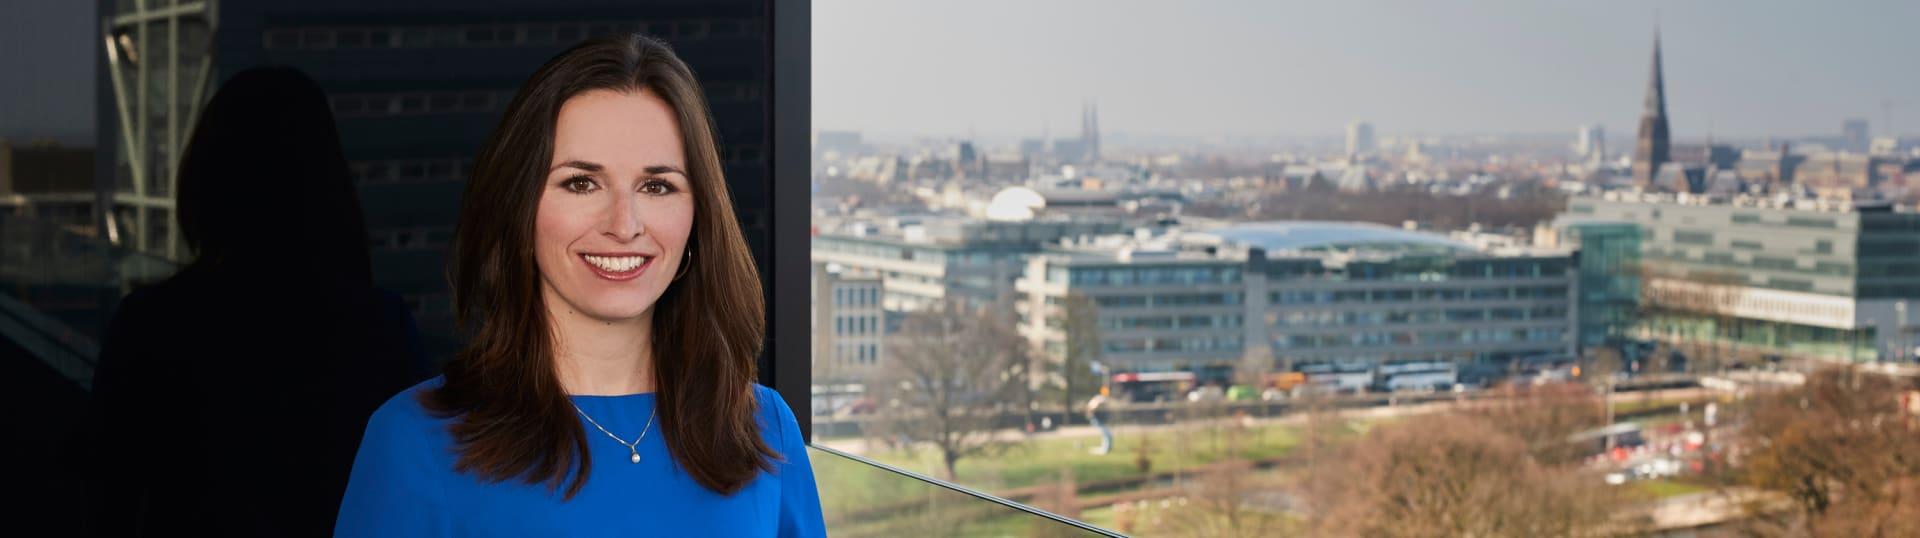 Marieke de Vries, advocaat Pels Rijcken